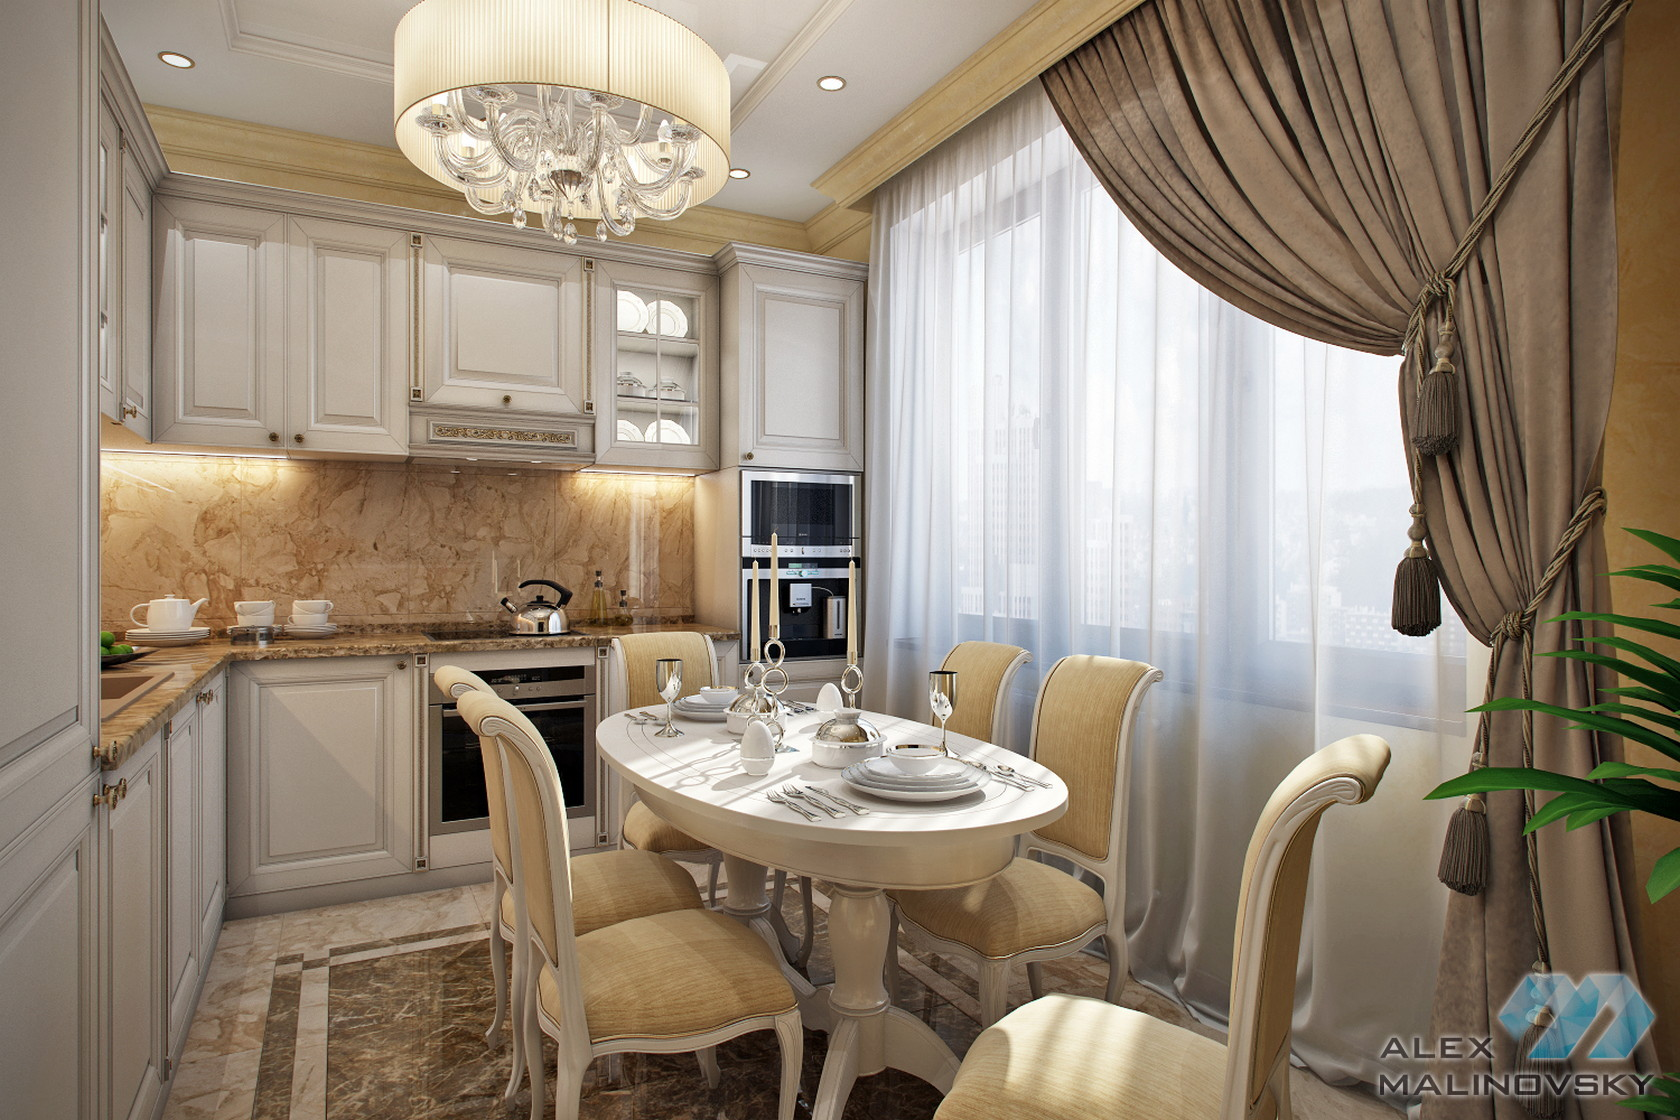 Кухня, 4х комнатная квартира, ул. Веерная, Москва